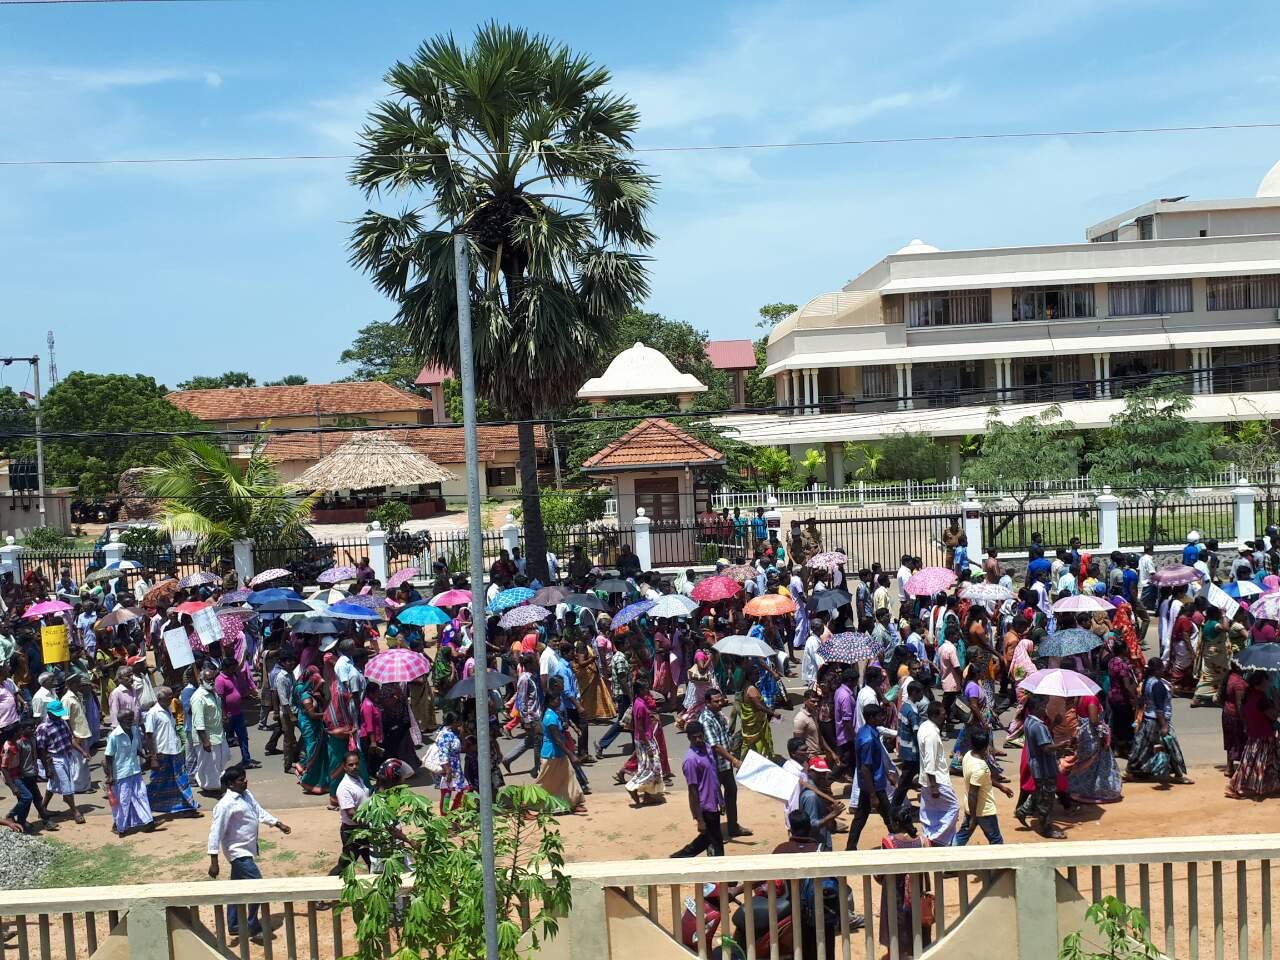 Massive Protest Rallyagainst planned Sinhala Colonization in Mulaitheevu – Thousands participate